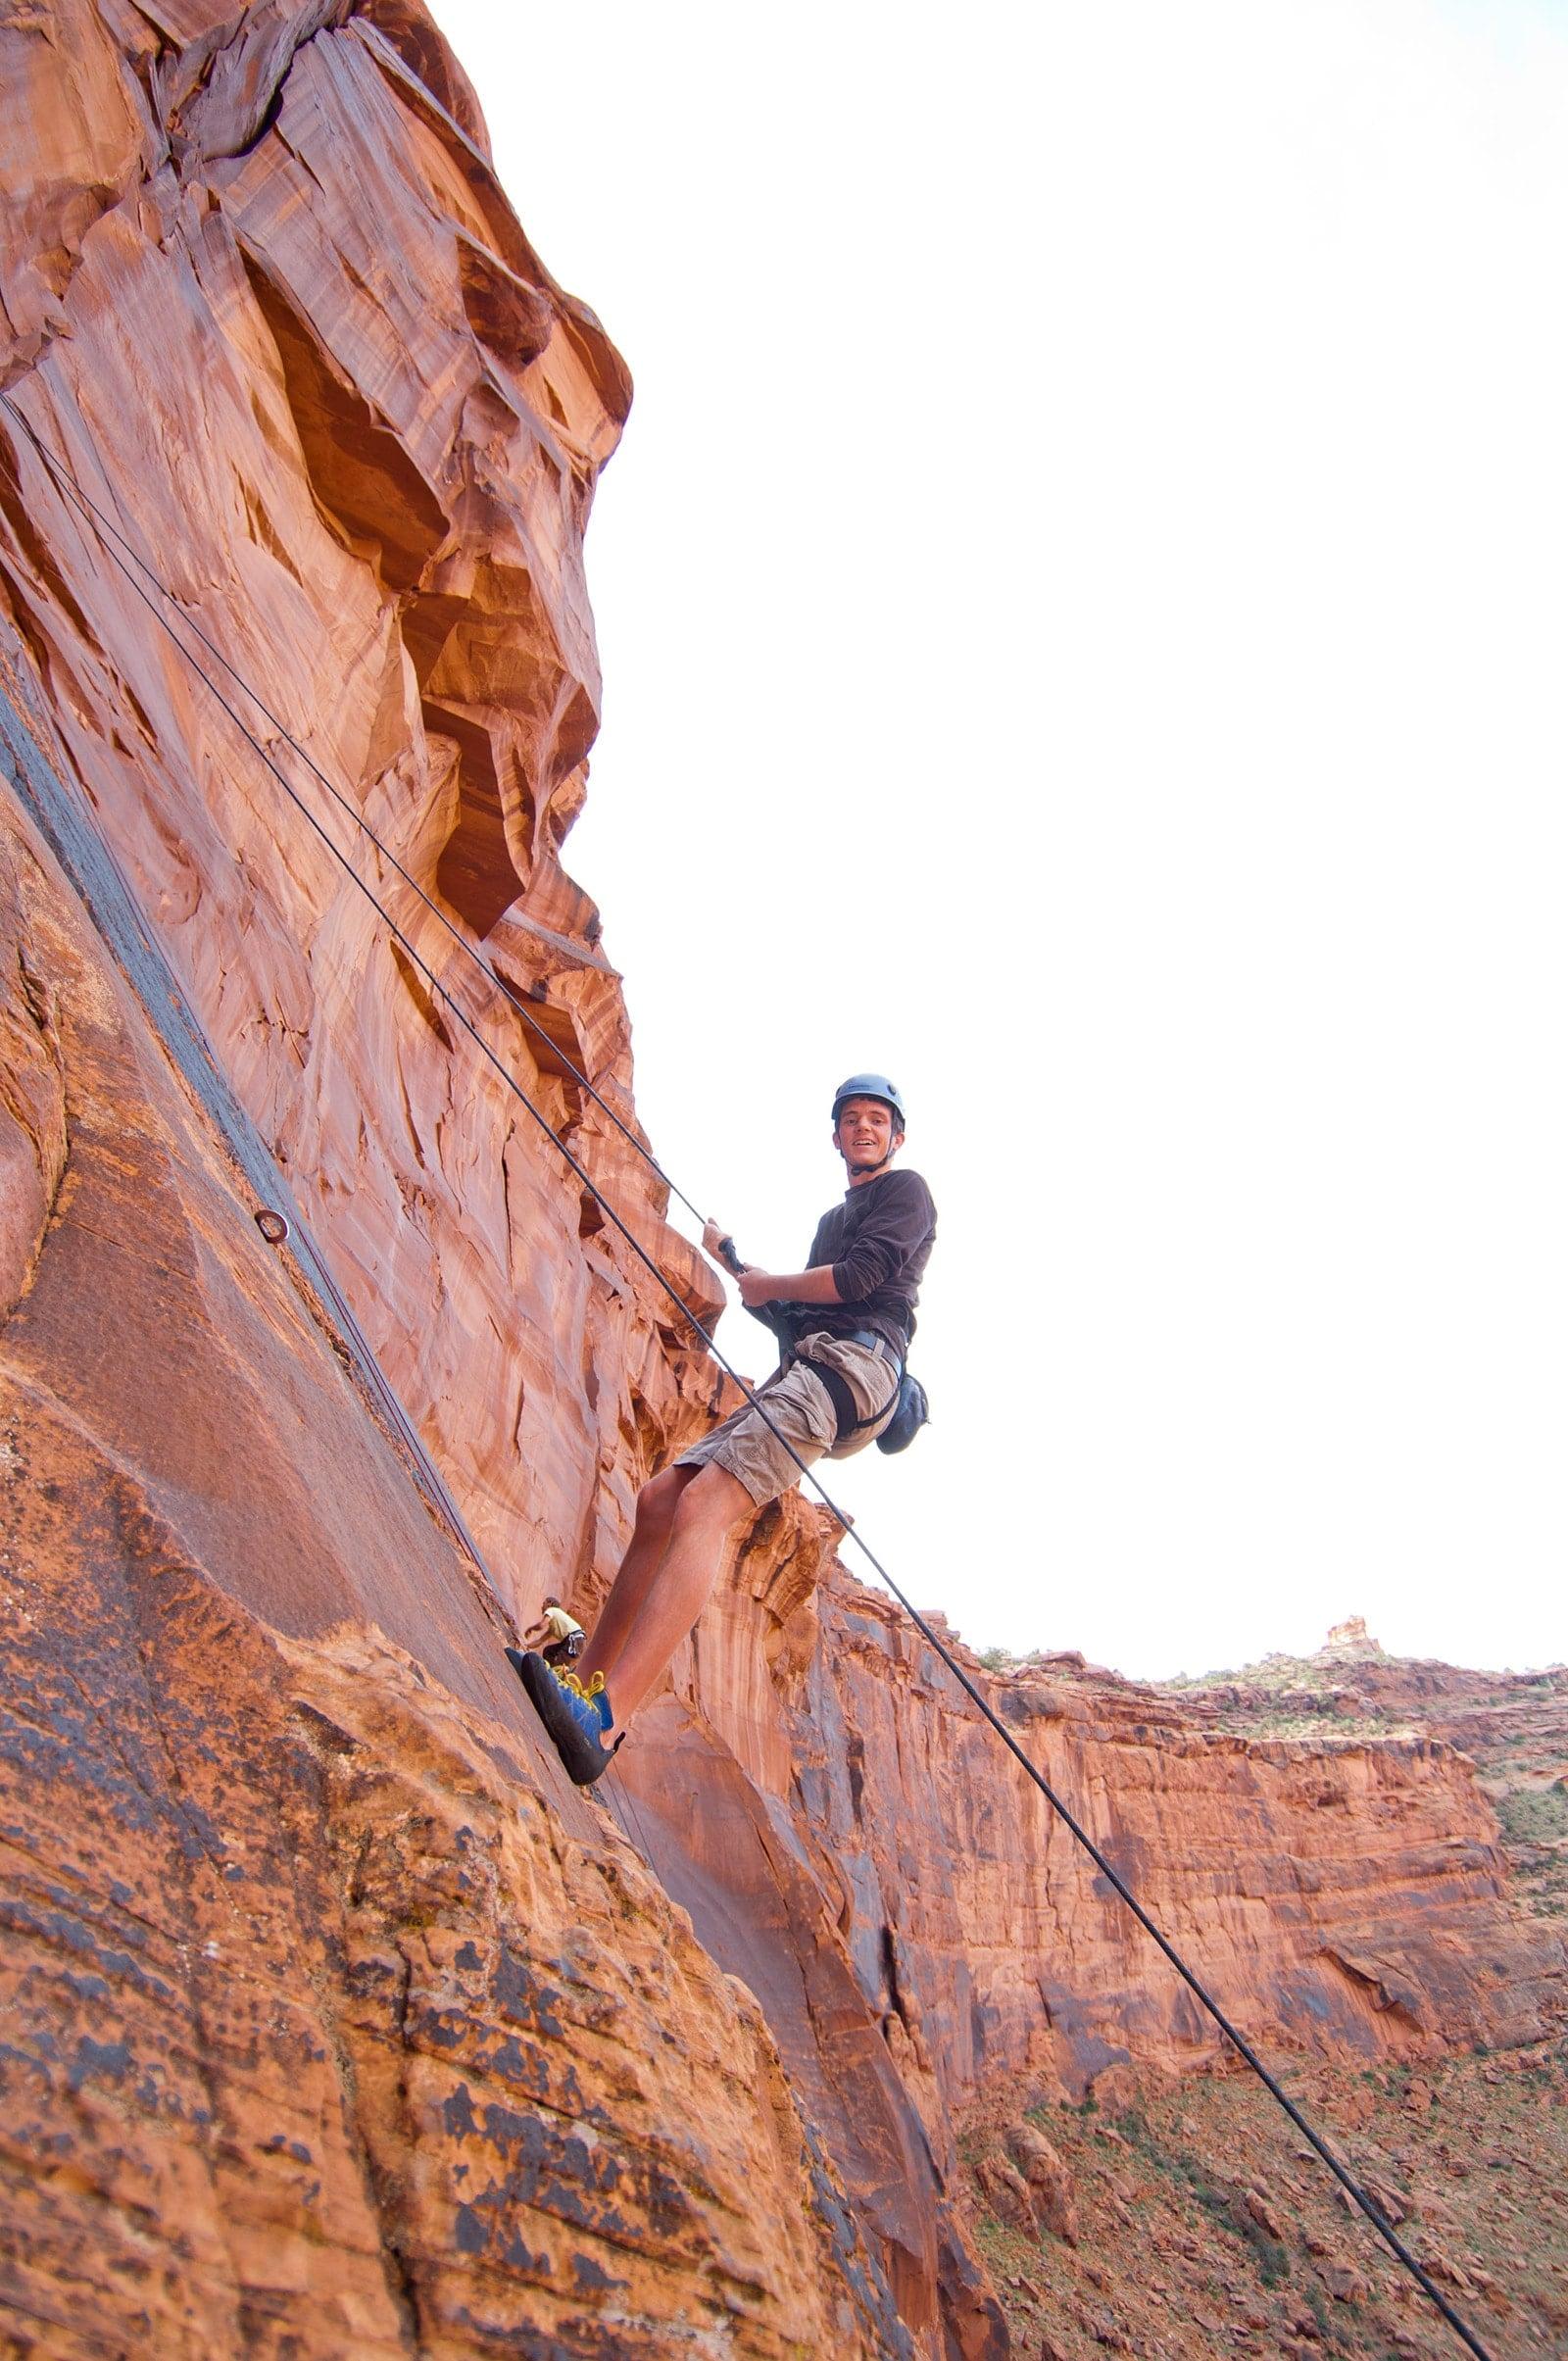 Moab Rock Climbing Photos